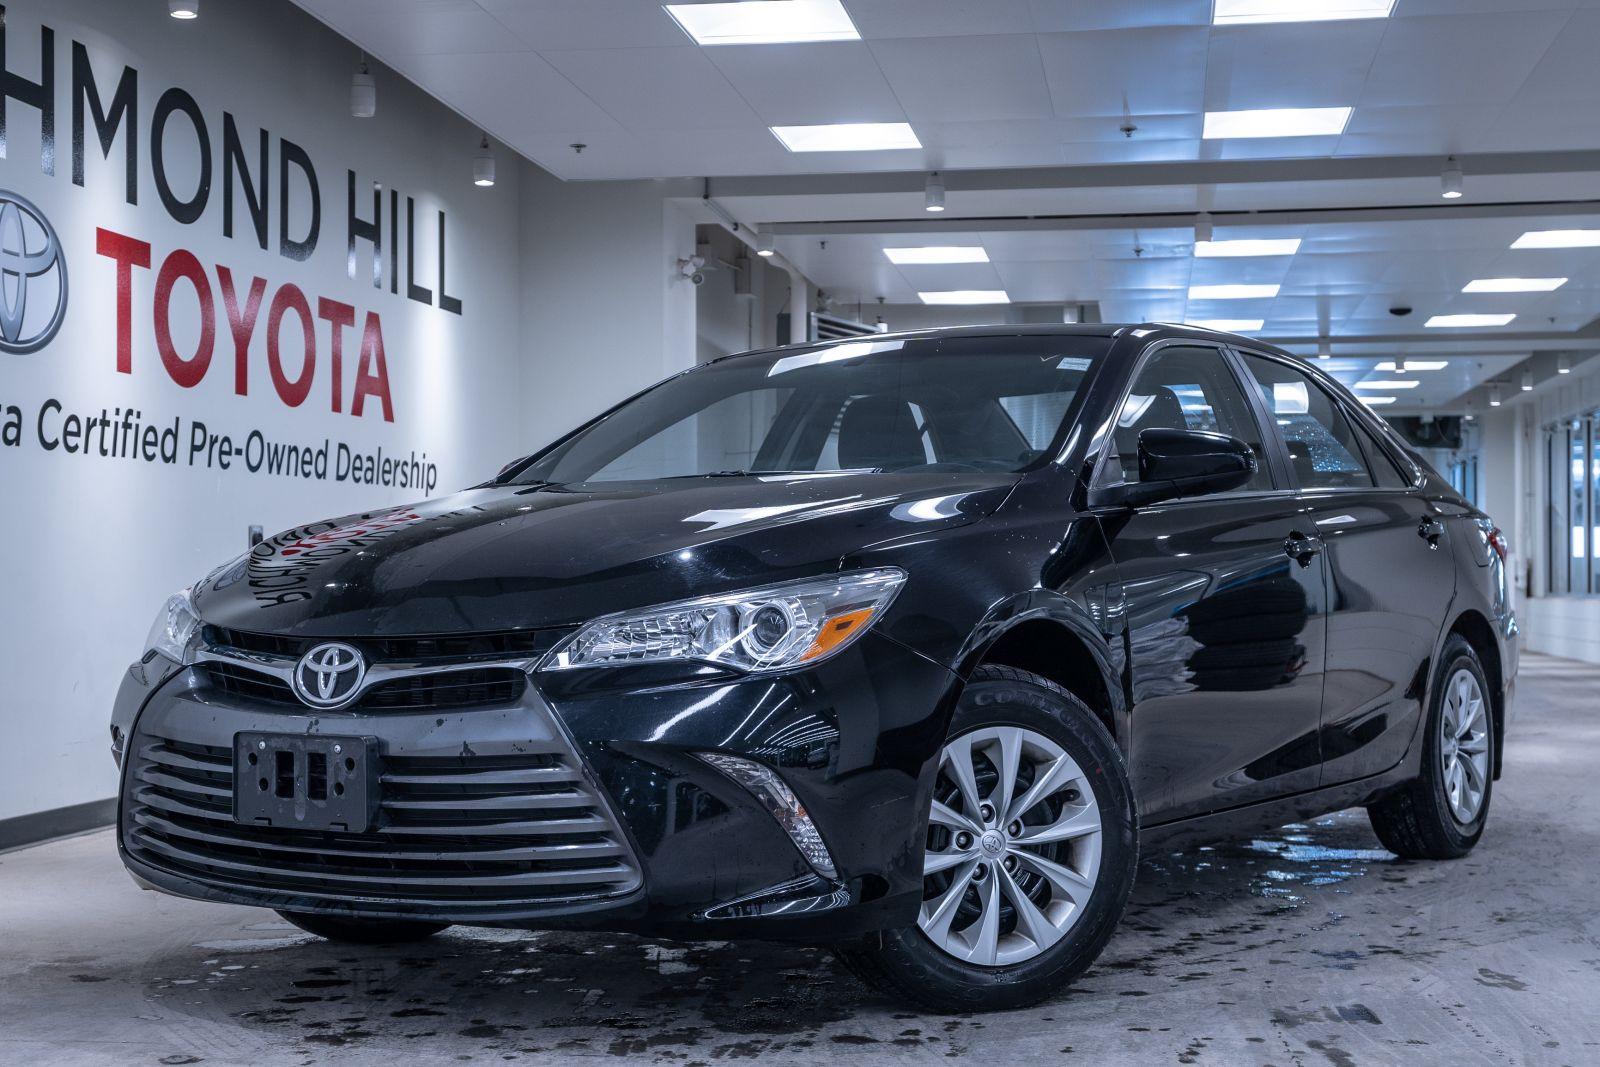 2017 Toyota Camry Image